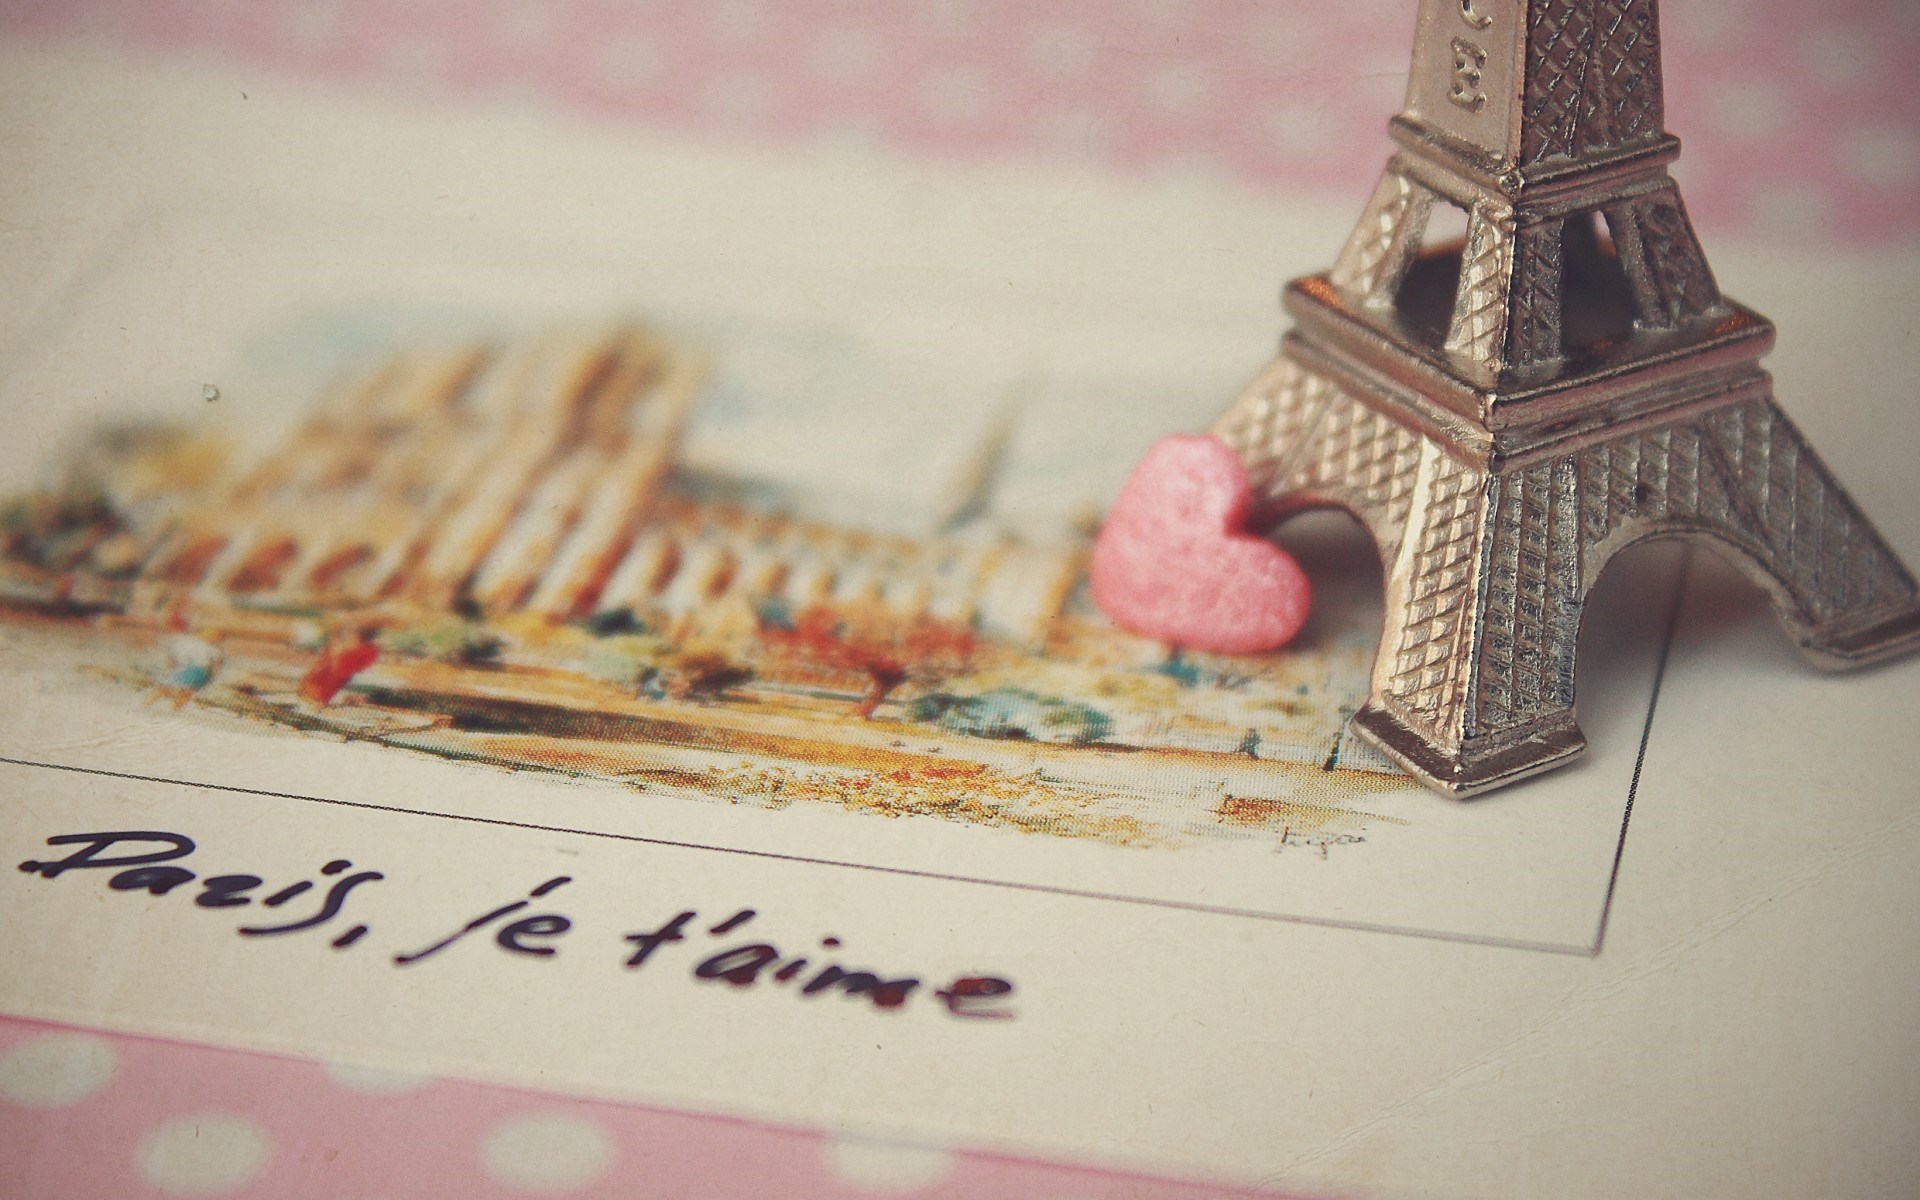 Wallpaper download paris - Download Paris Wallpaper 22120